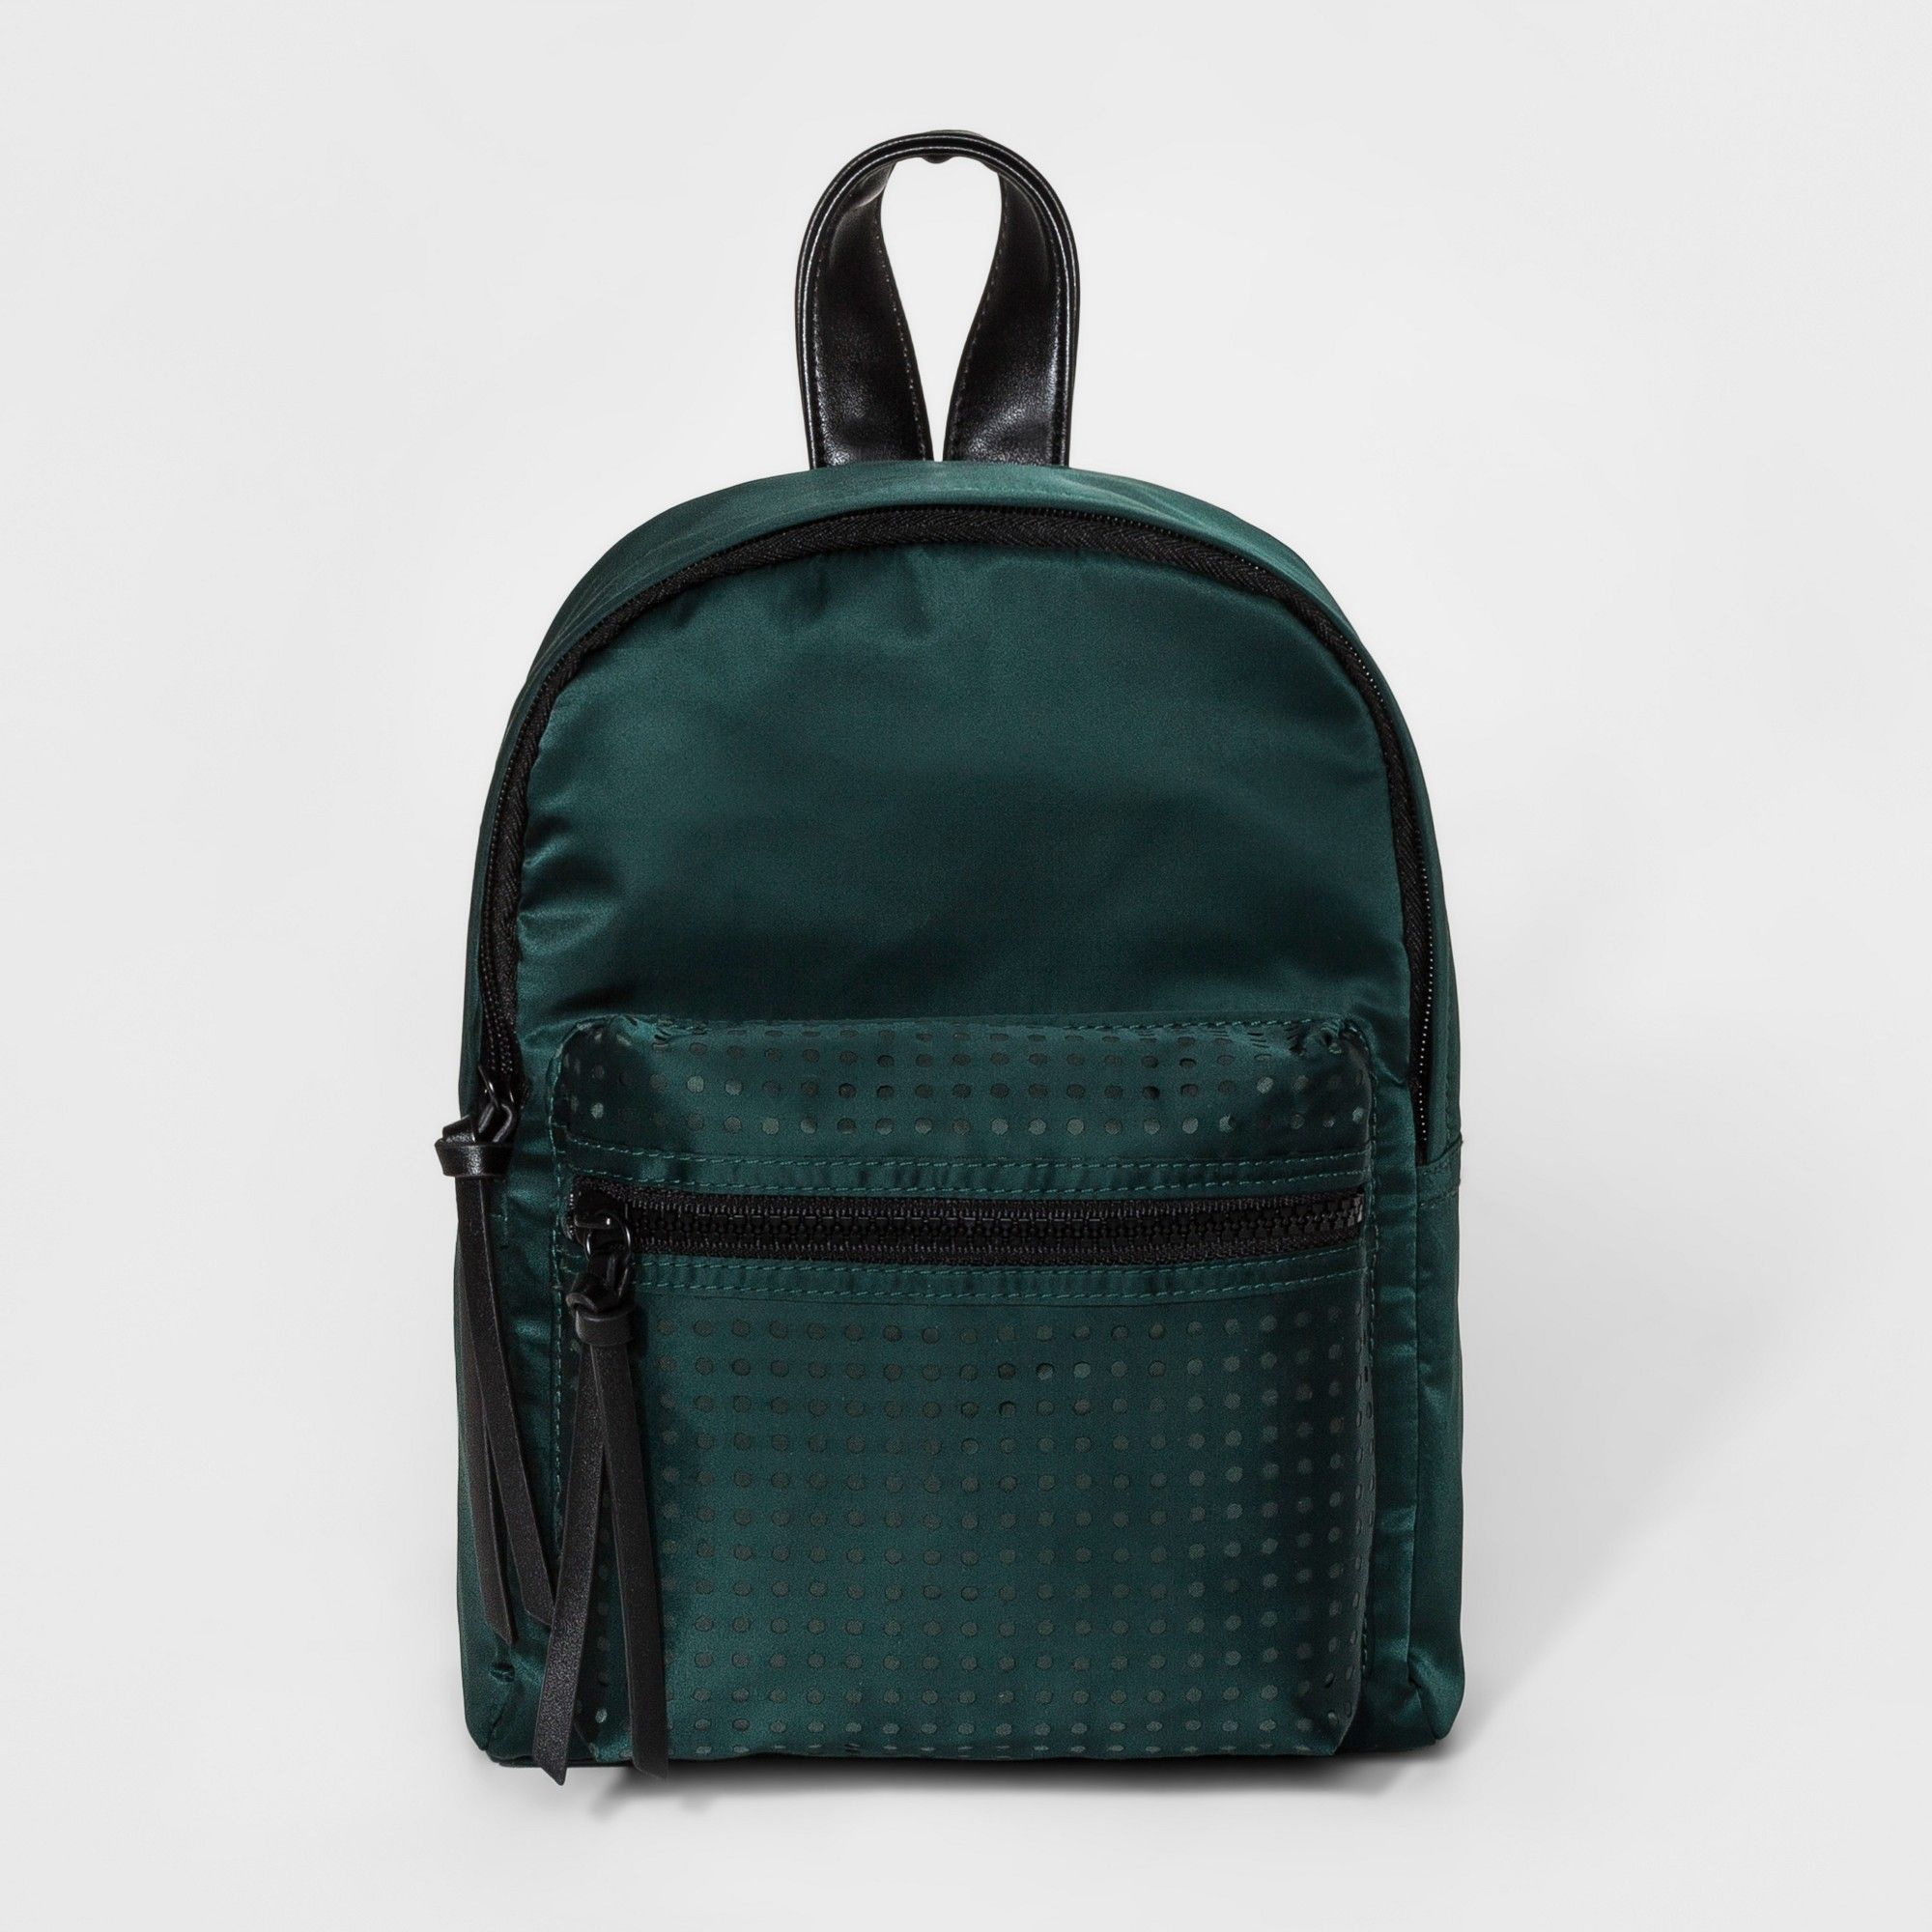 4403d1817a Women s Mini Backpack Handbag - Mossimo Supply Co. Green